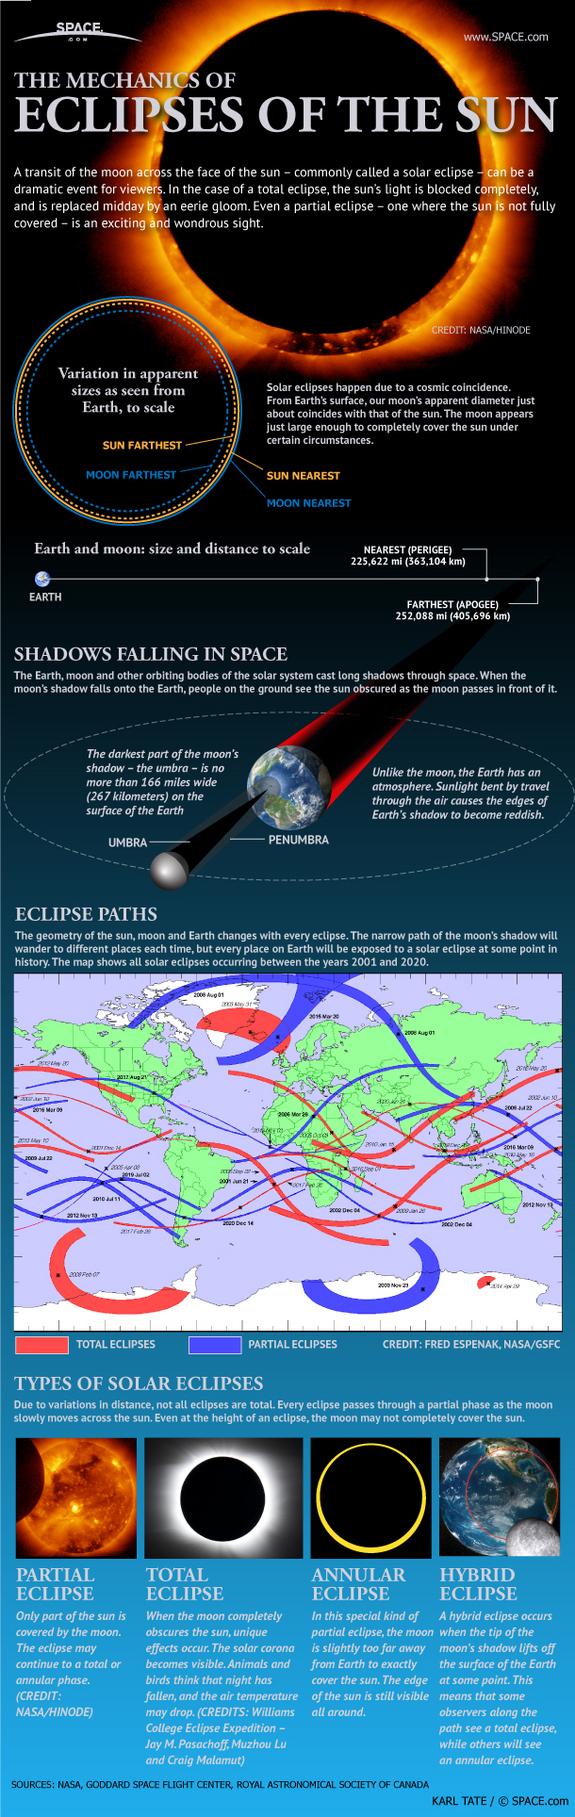 Mechanics of Solar Eclipse